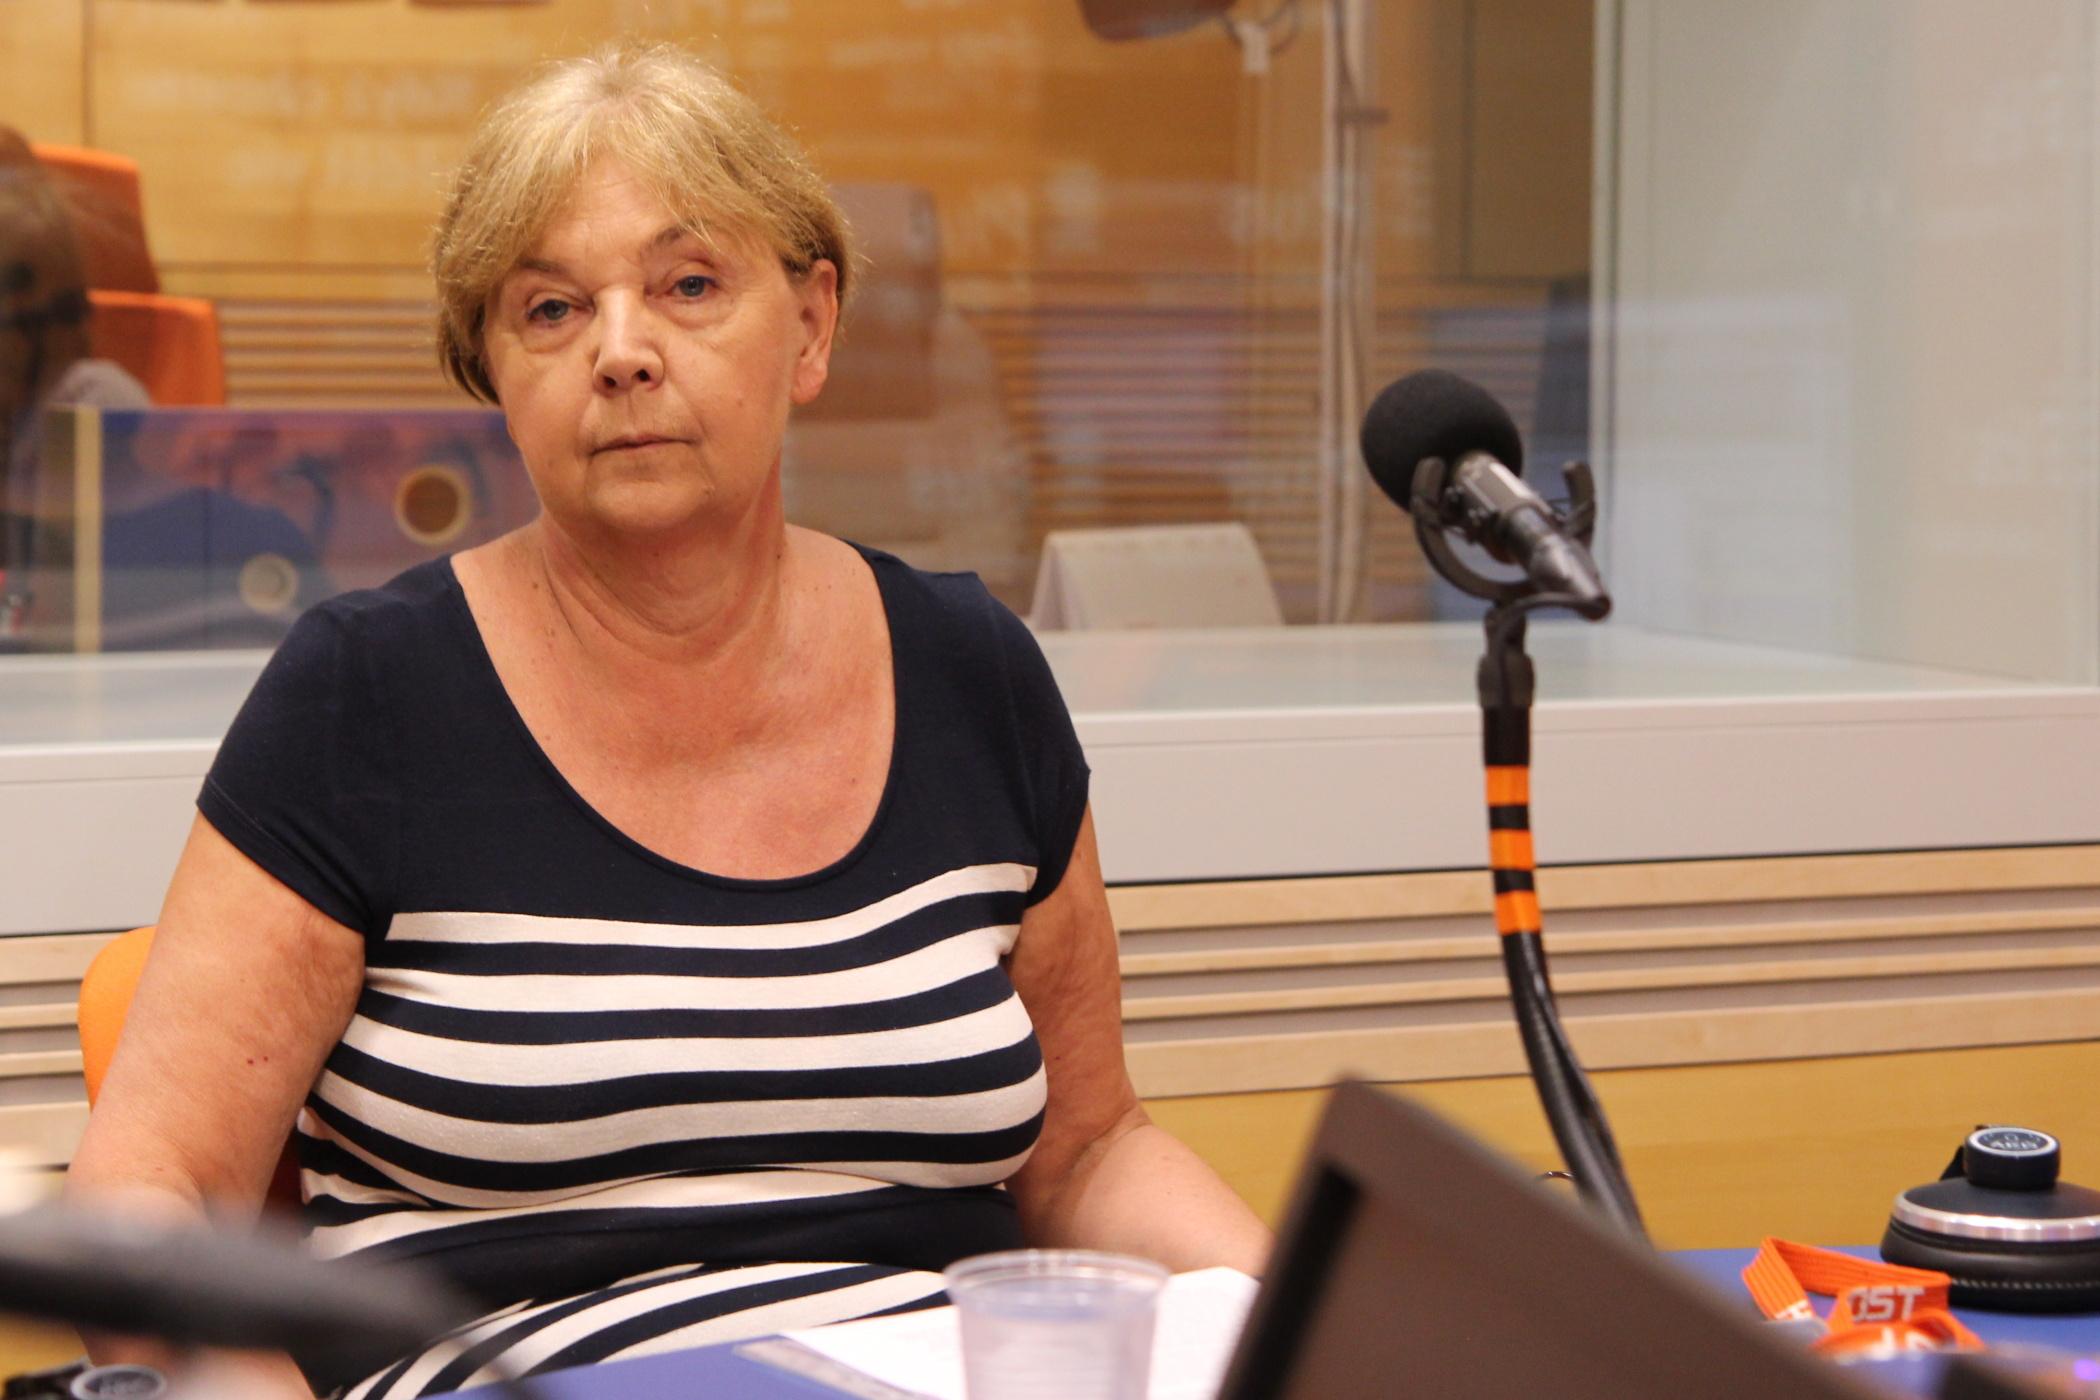 Barbora Osvaldová